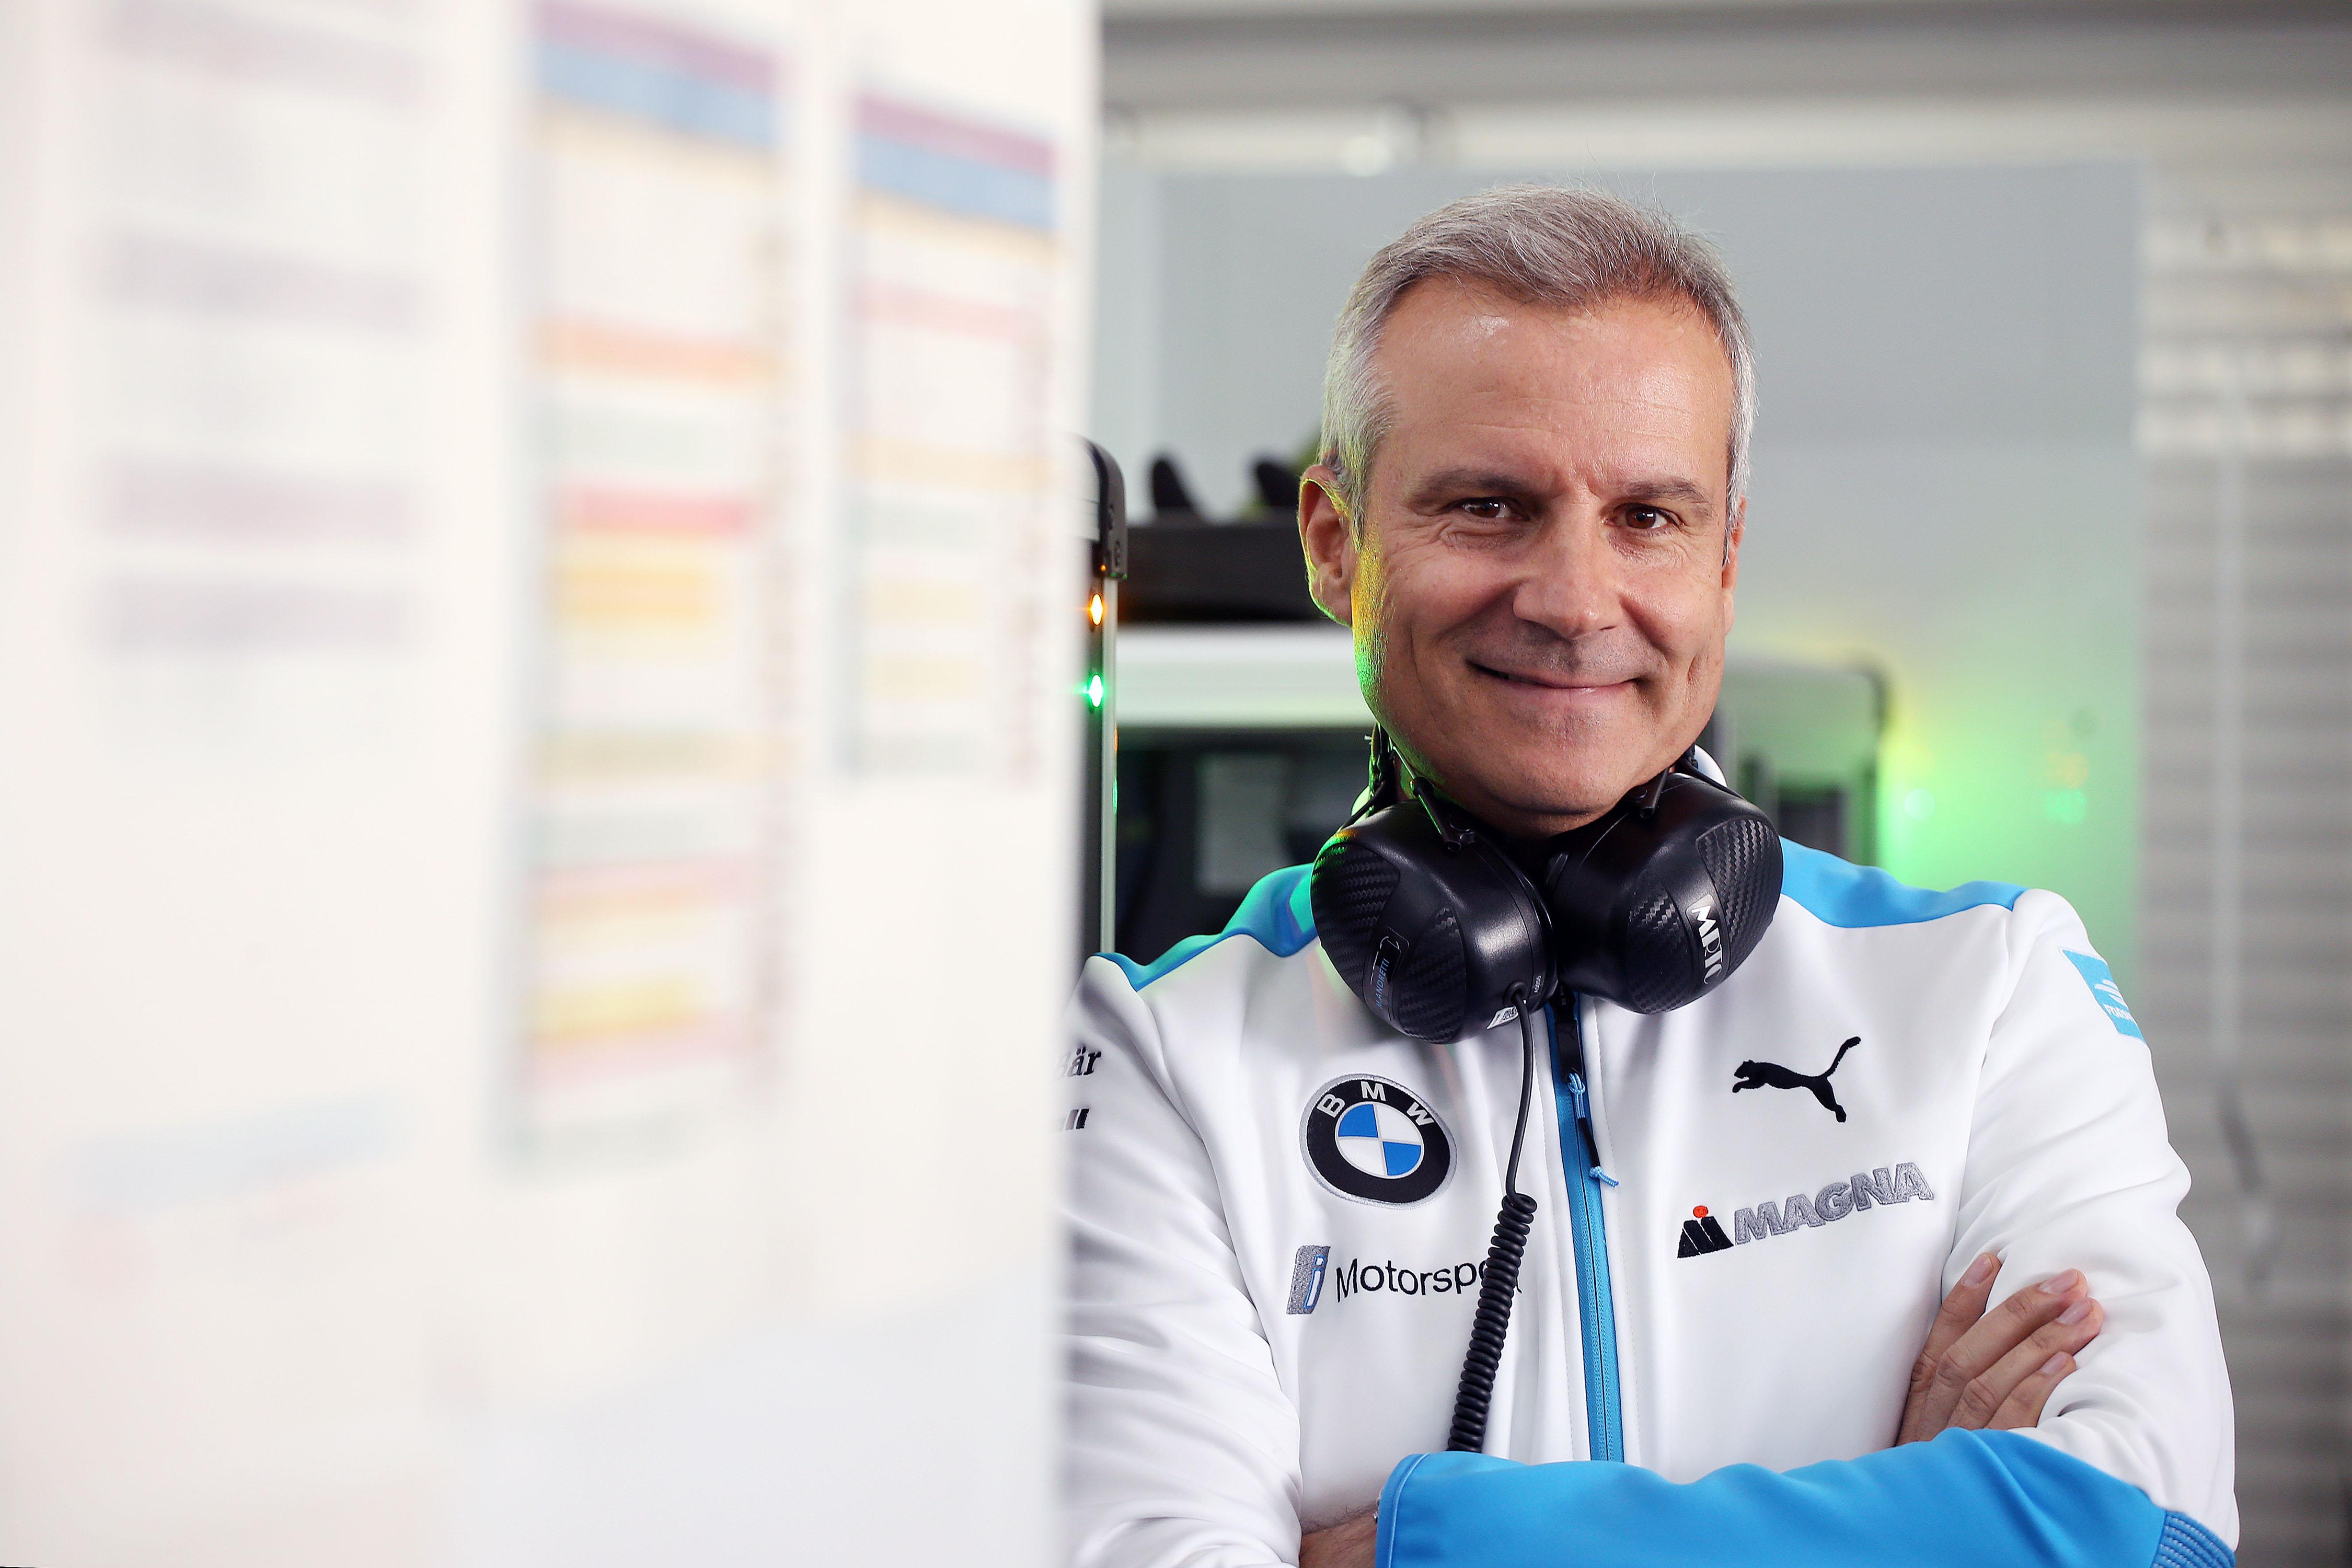 Valencia (ESP), BMW i Motorsport, ABB FIA Formula E Championship, BMW i Andretti Motorsport, Jens Marquardt (GER)